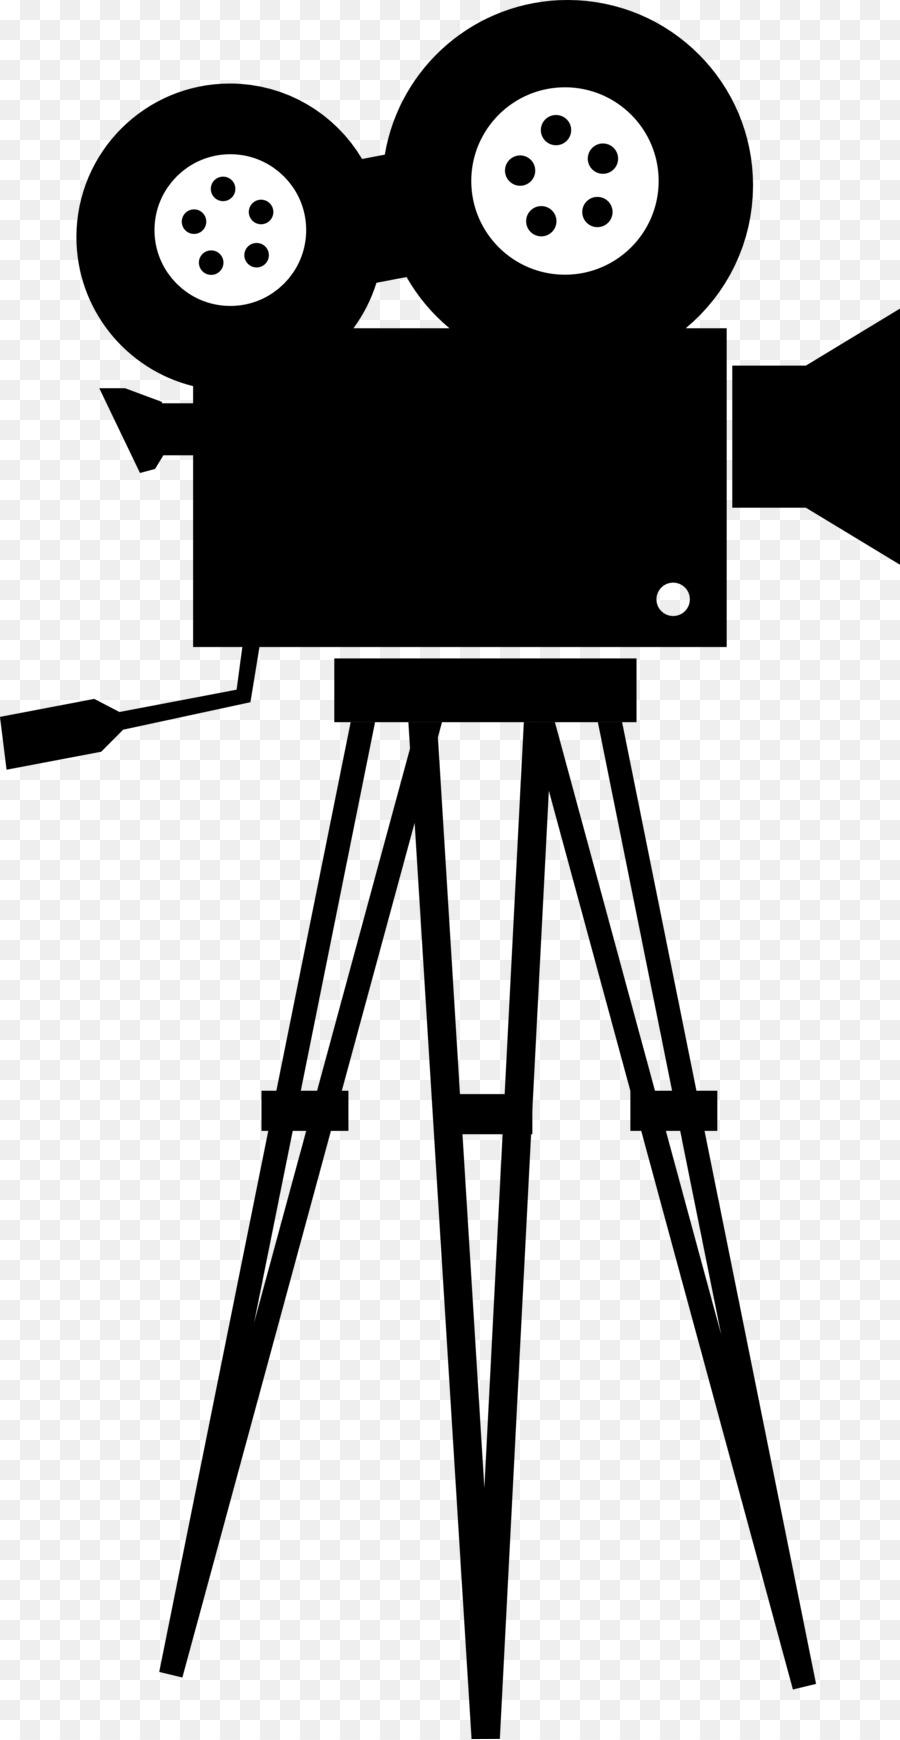 movie camera film director clip art movie film cliparts png rh kisspng com old film camera clipart film camera clipart free